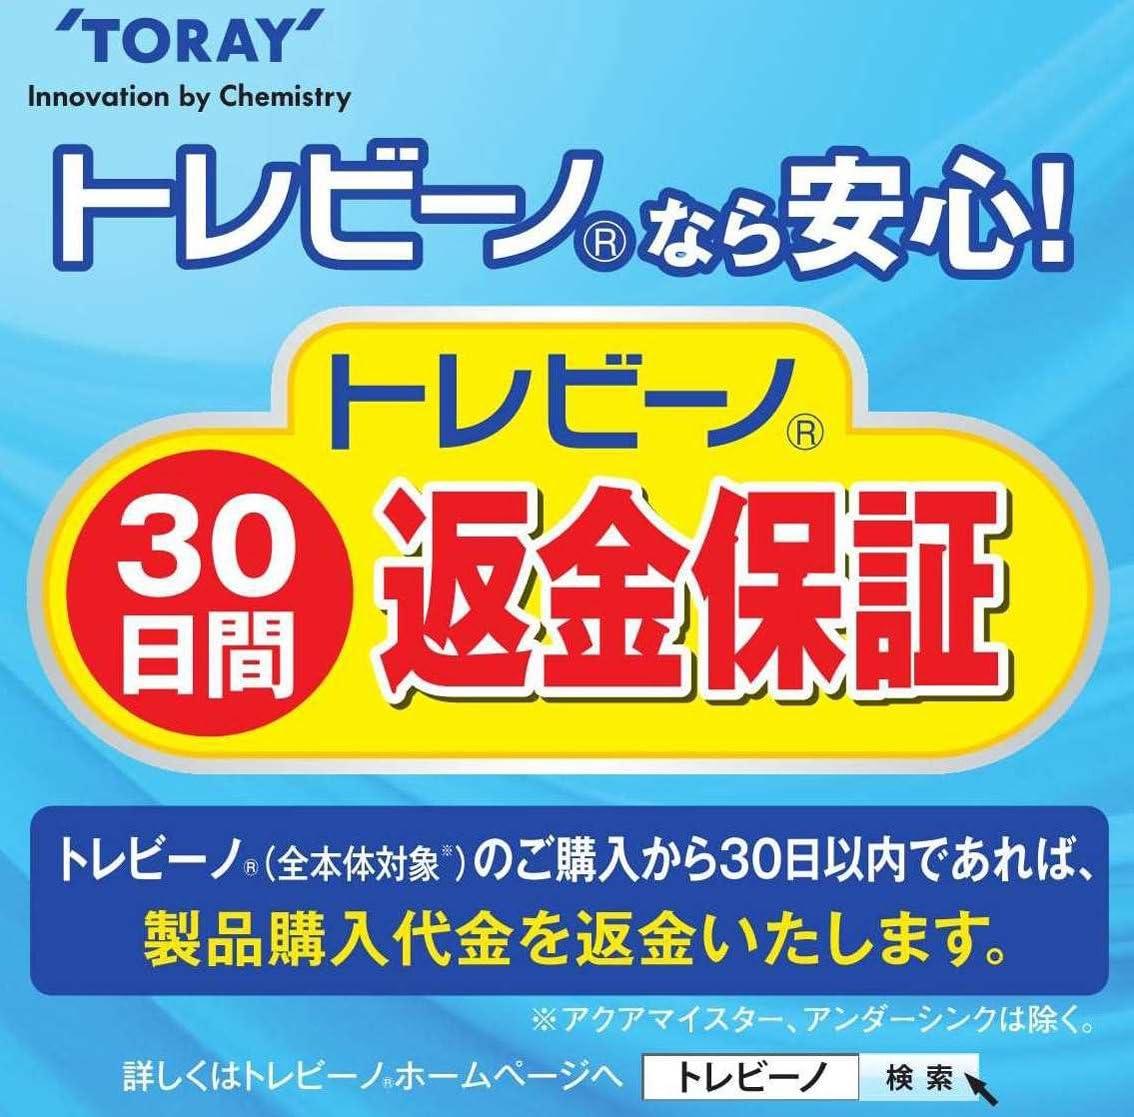 TORAY torayvino Pitcher-Type Water Purifier 1.1L PT302SV